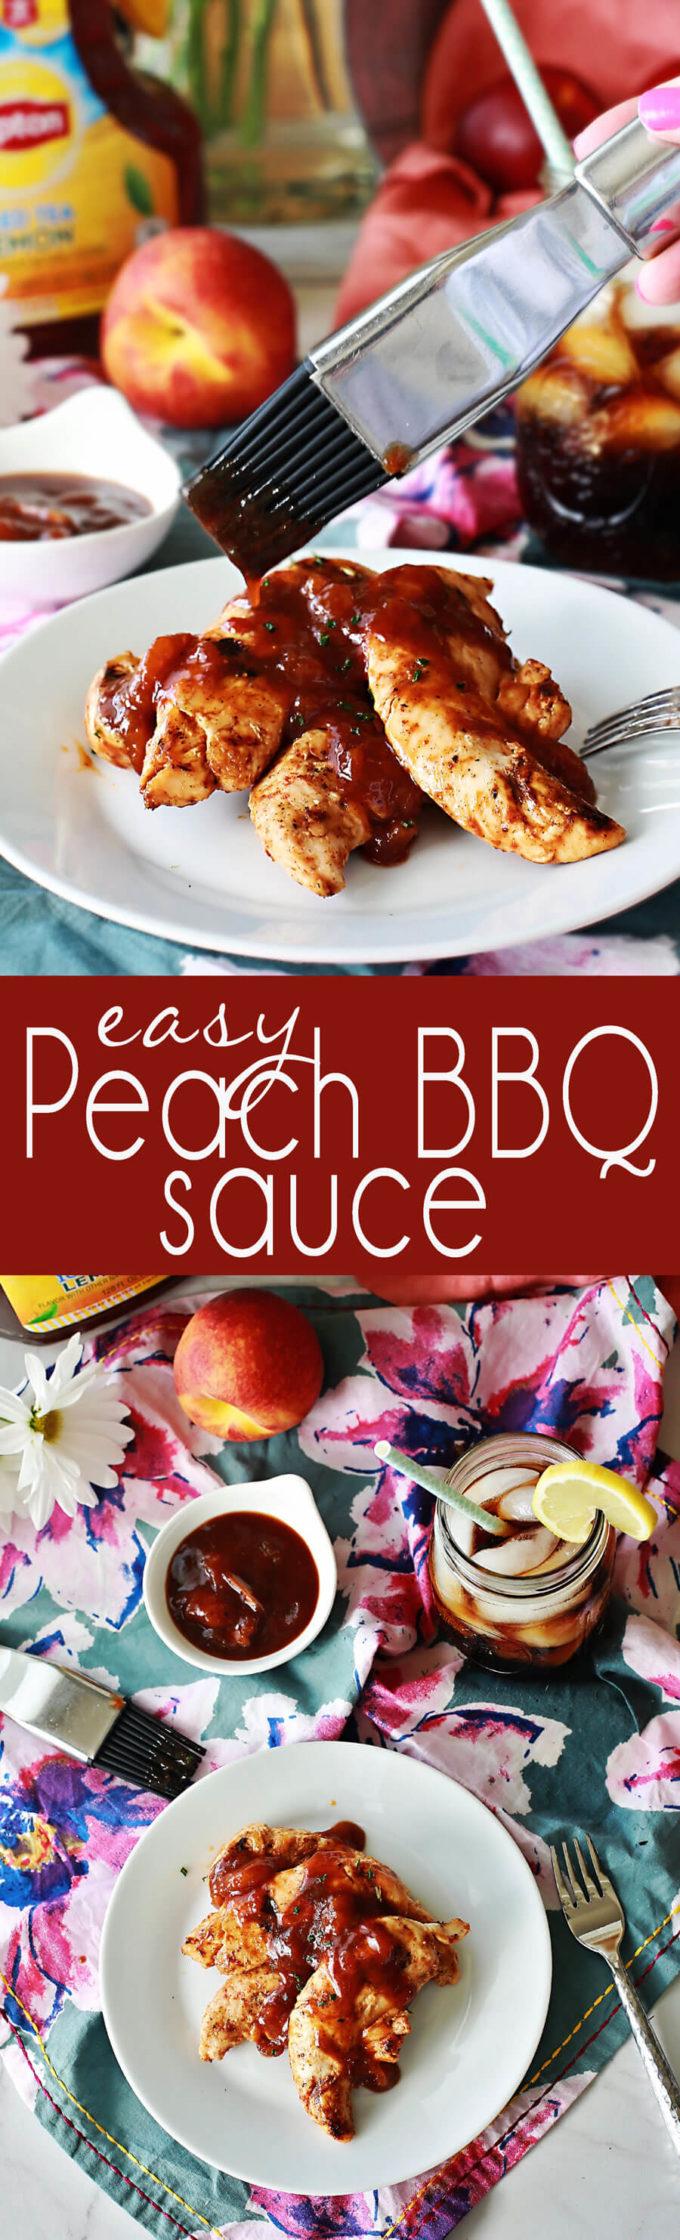 easy peach bbq sauce